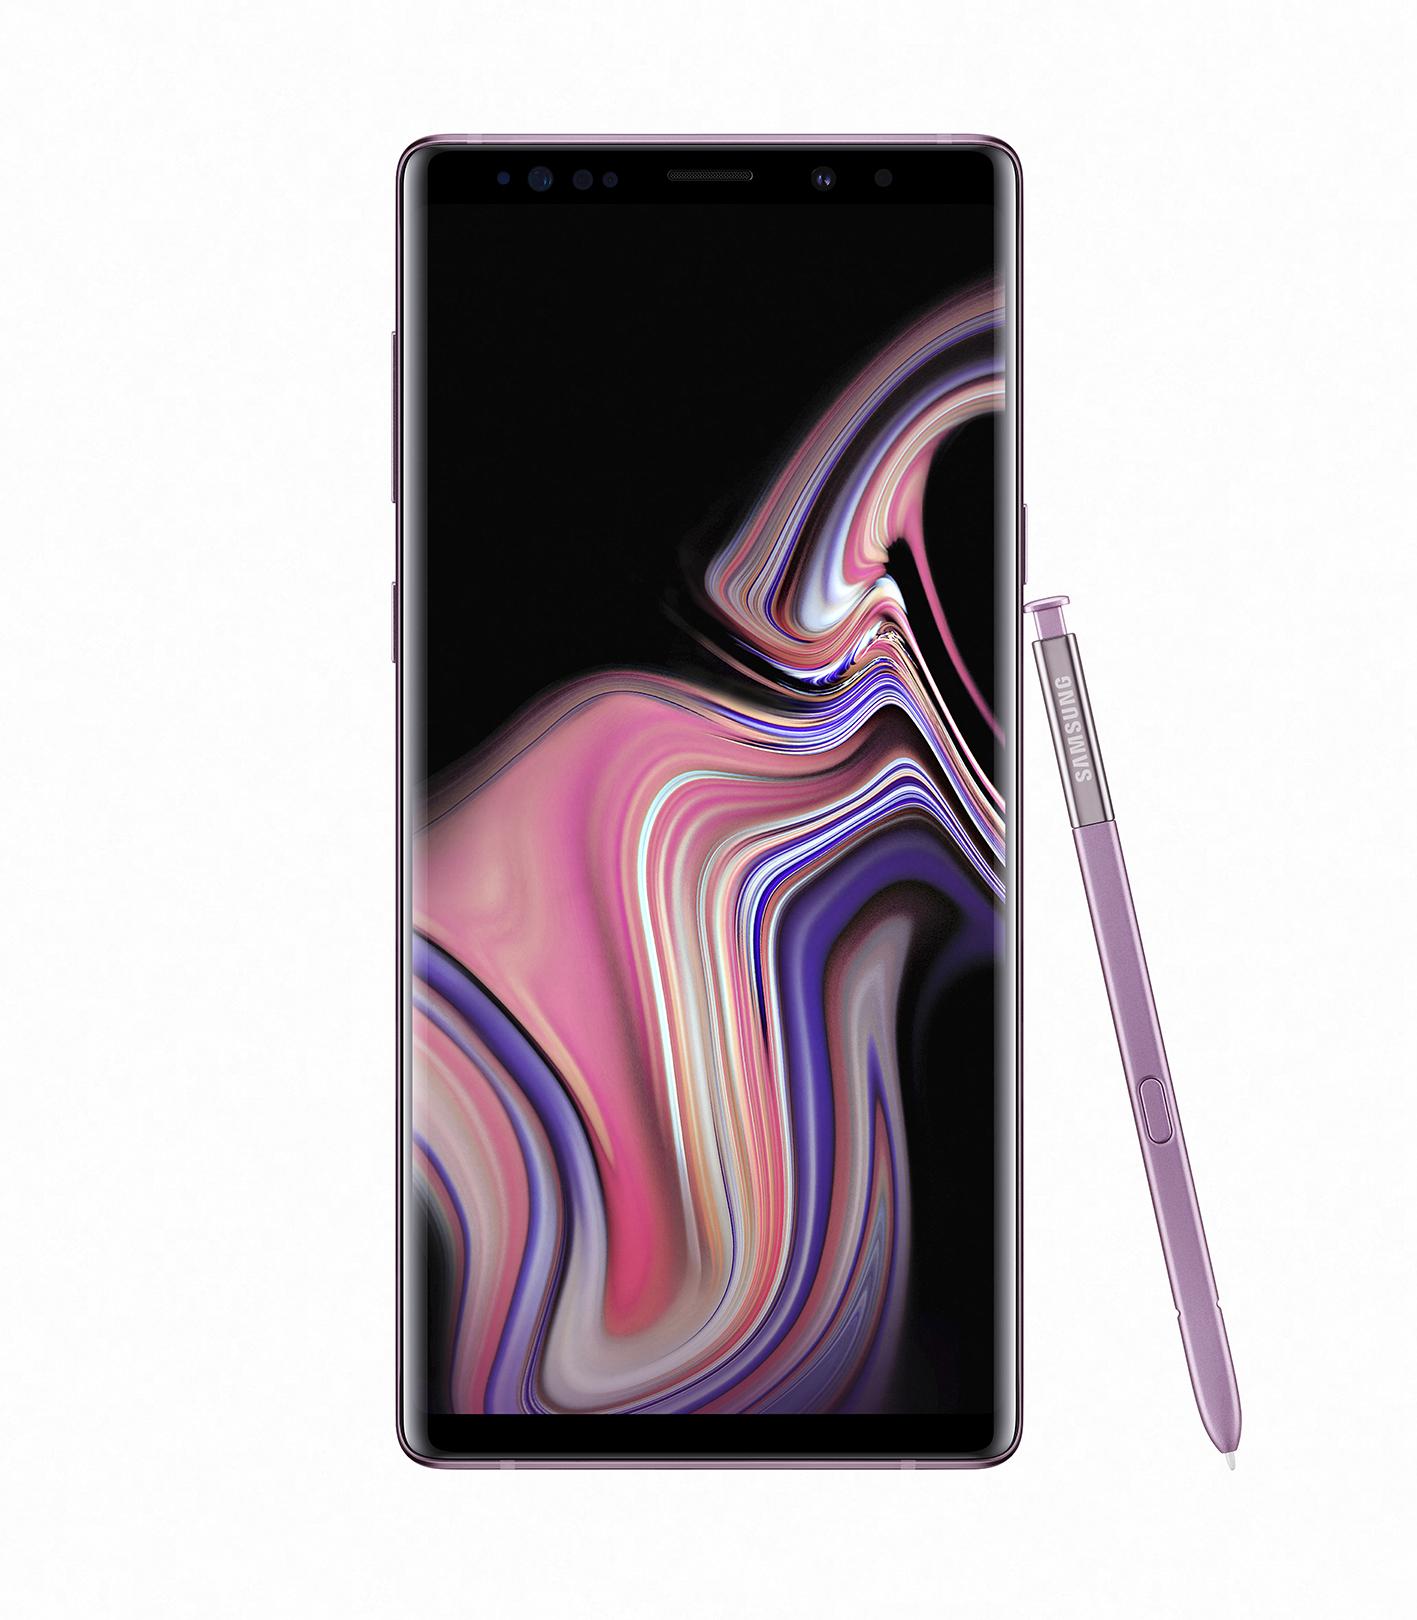 03.Lavender Purple_galaxynote9_front_pen